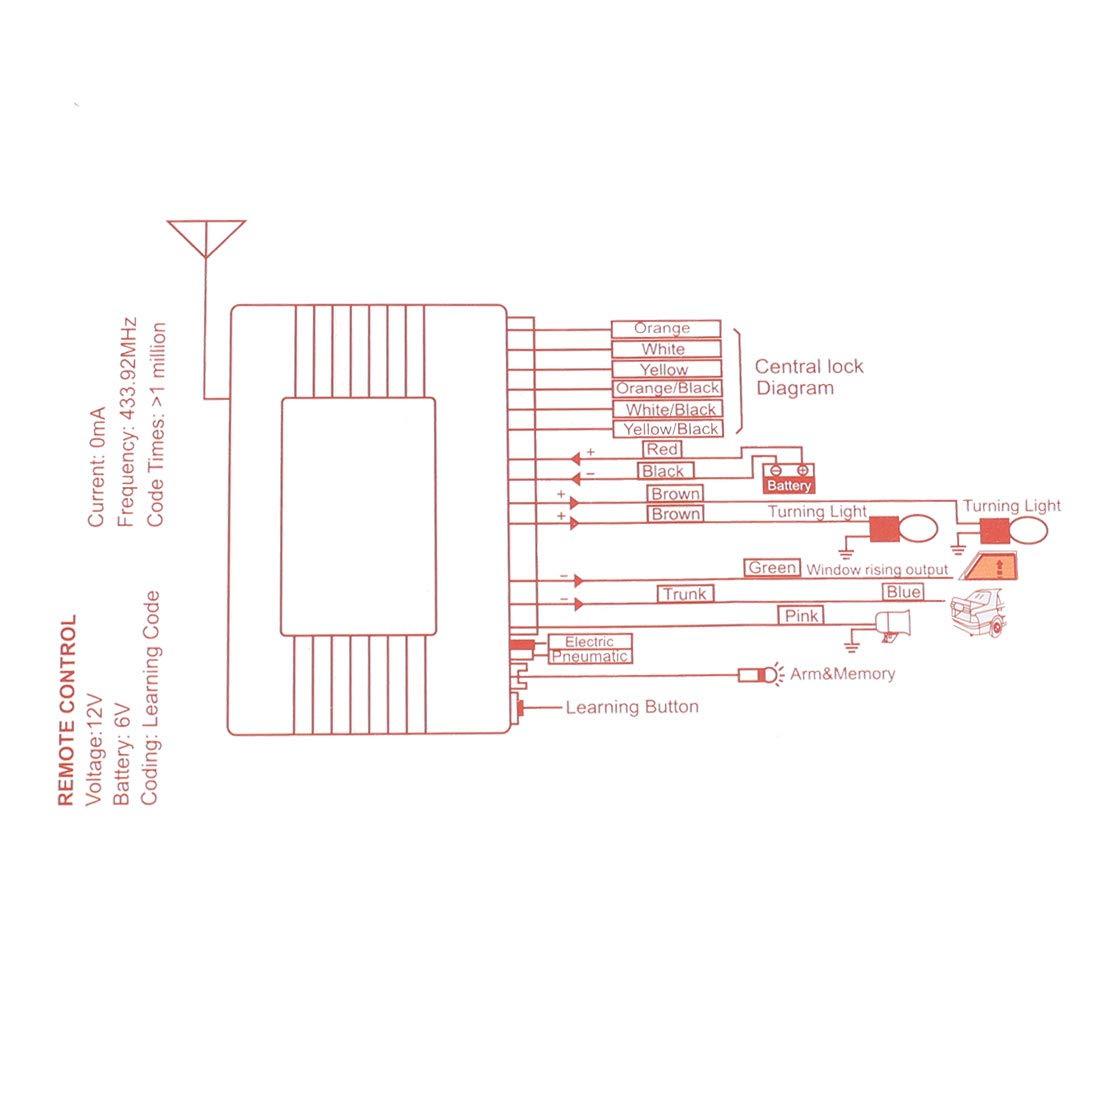 Nt 6934 Central Door Lock Wiring Diagram Wiring Diagram